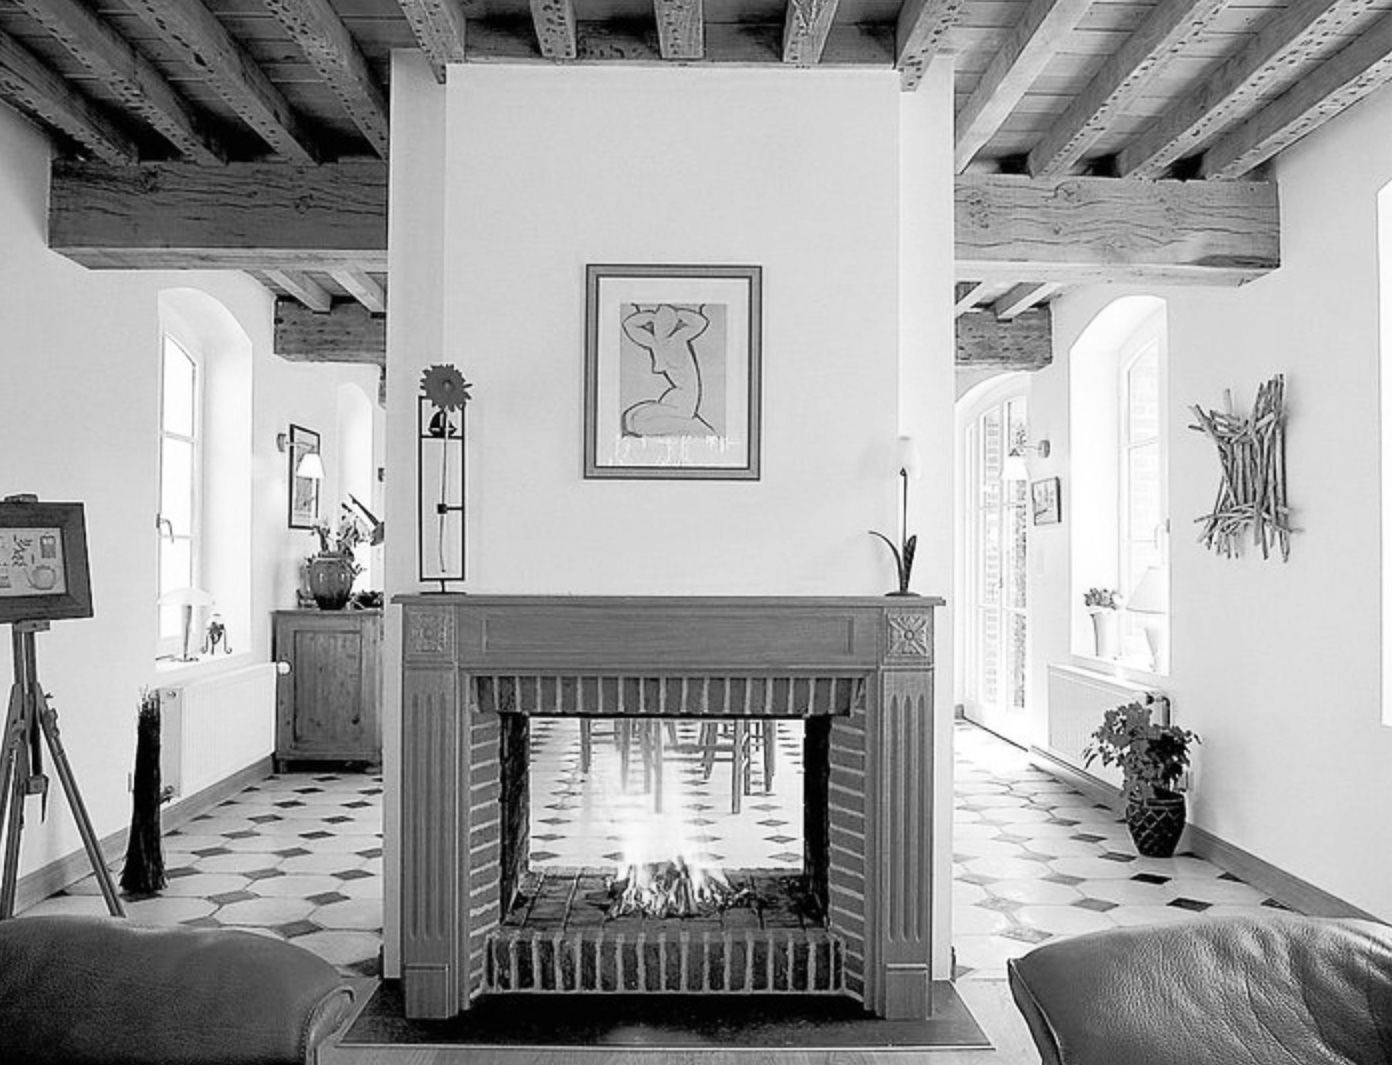 chemin e traversante casanearshore casablanca rent a superb furnished architect villa. Black Bedroom Furniture Sets. Home Design Ideas